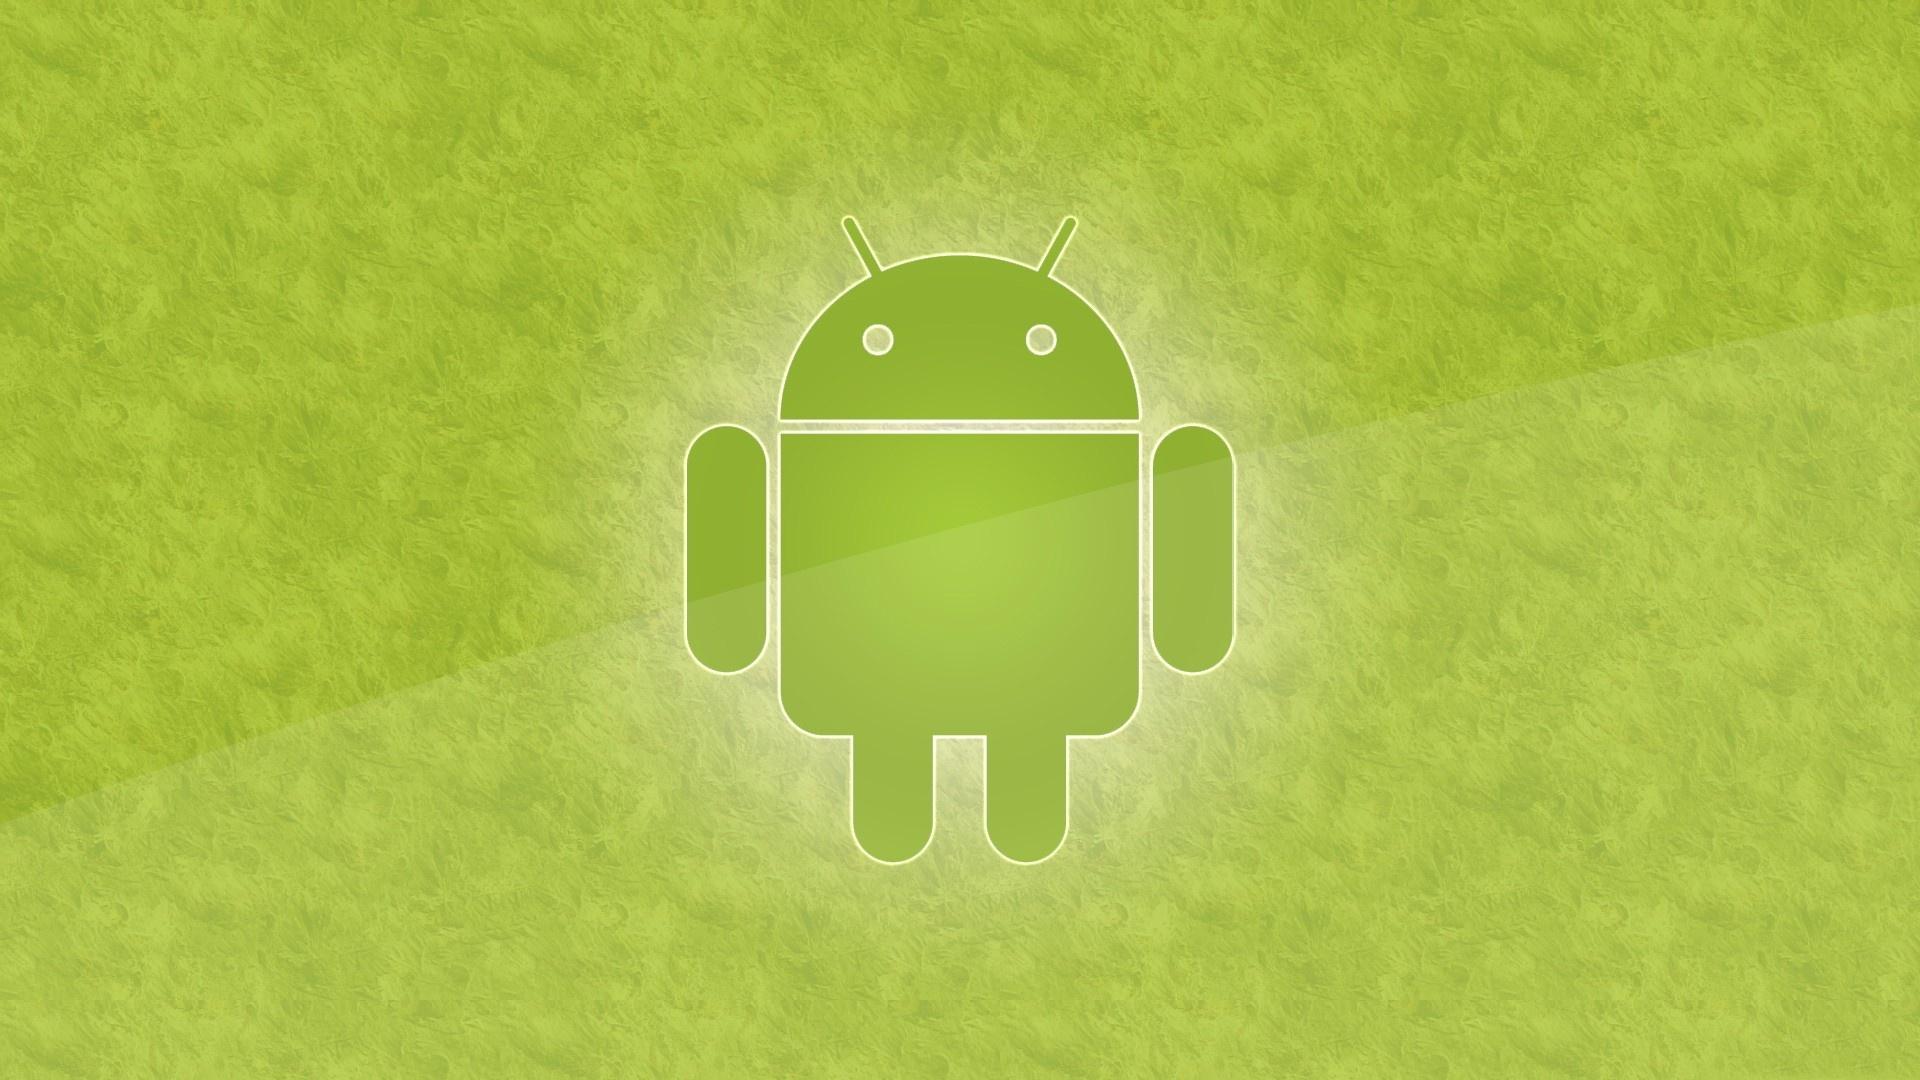 http://2.bp.blogspot.com/-uPQf0SbXnDo/UIFdyR7OnqI/AAAAAAAAMbk/ZAif1vKRCuI/s0/android-logo-1920x1080.jpg